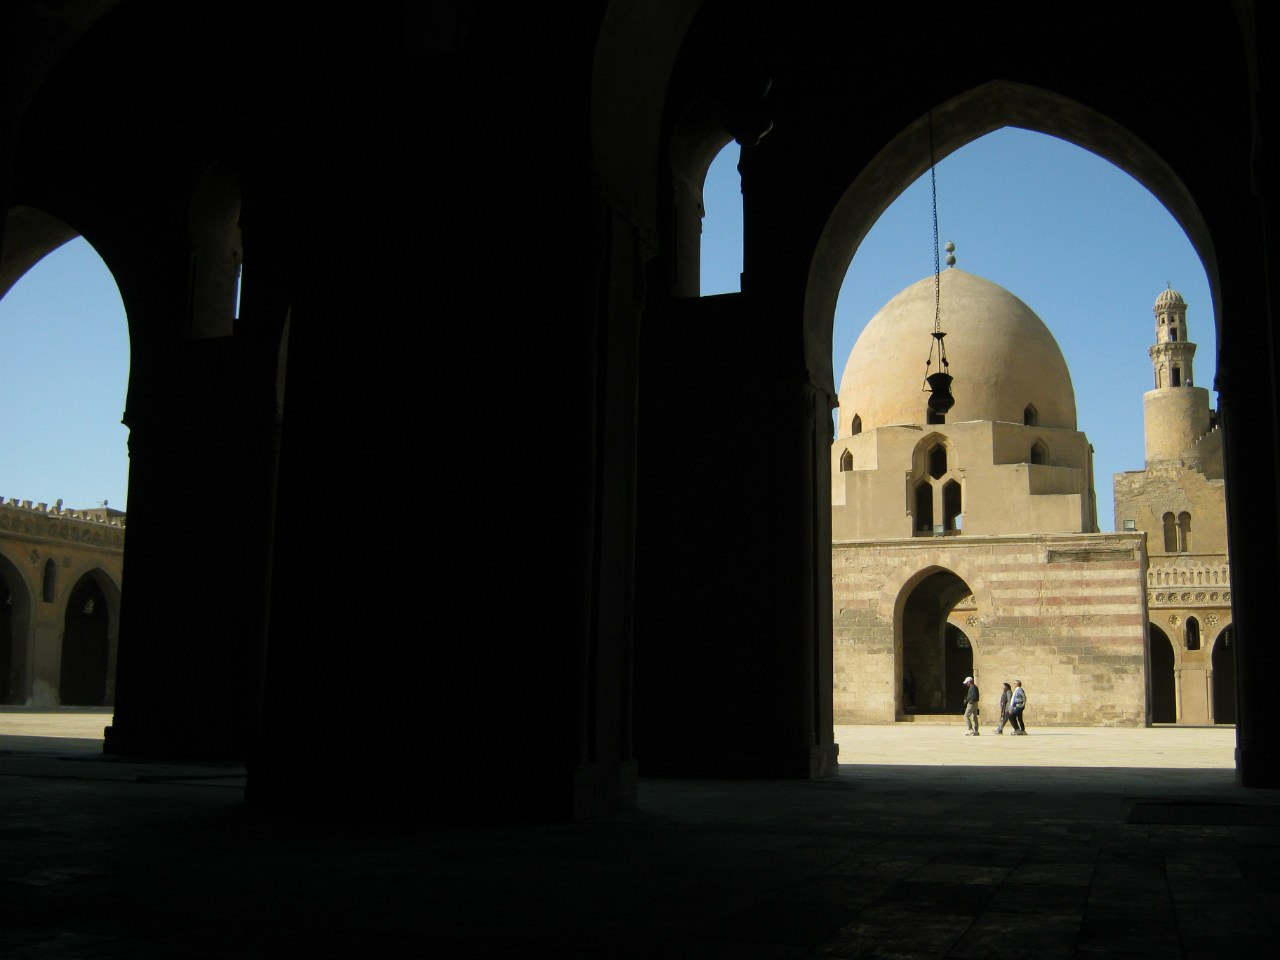 Мечеть Ахмед ибн Тулун в Каире